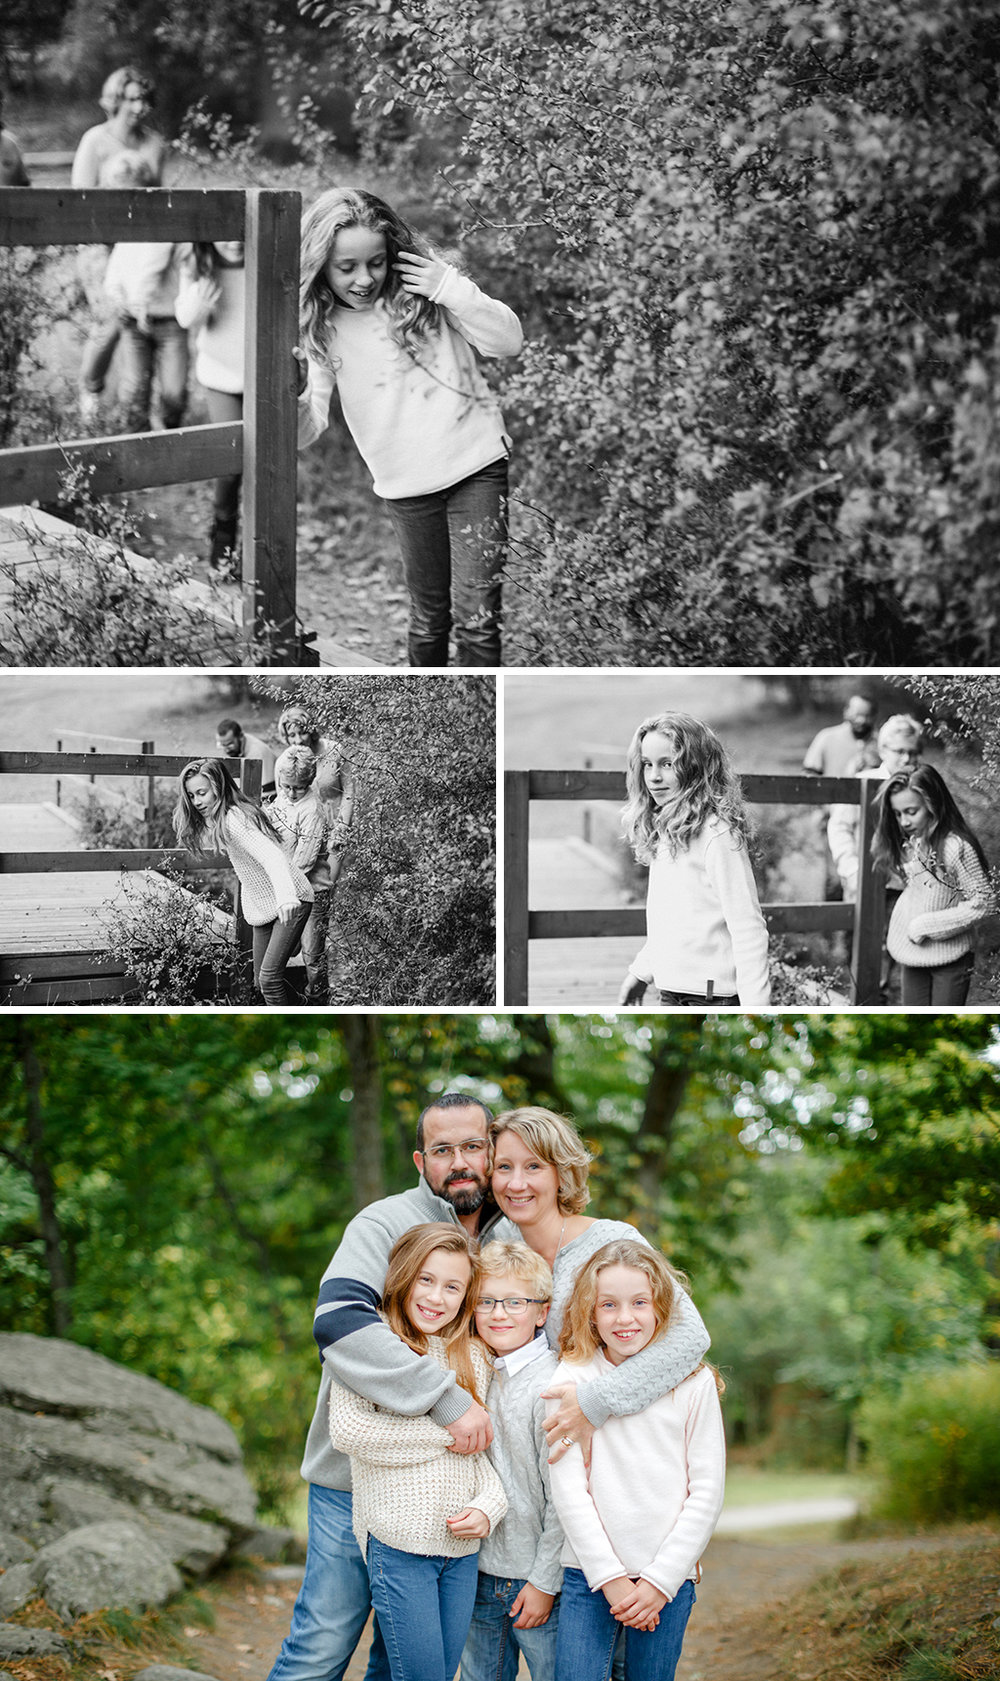 Familjefotografering_i-Stockholm_Lifestyle-familjefotograf-Anna-Sandstrom_3.jpg